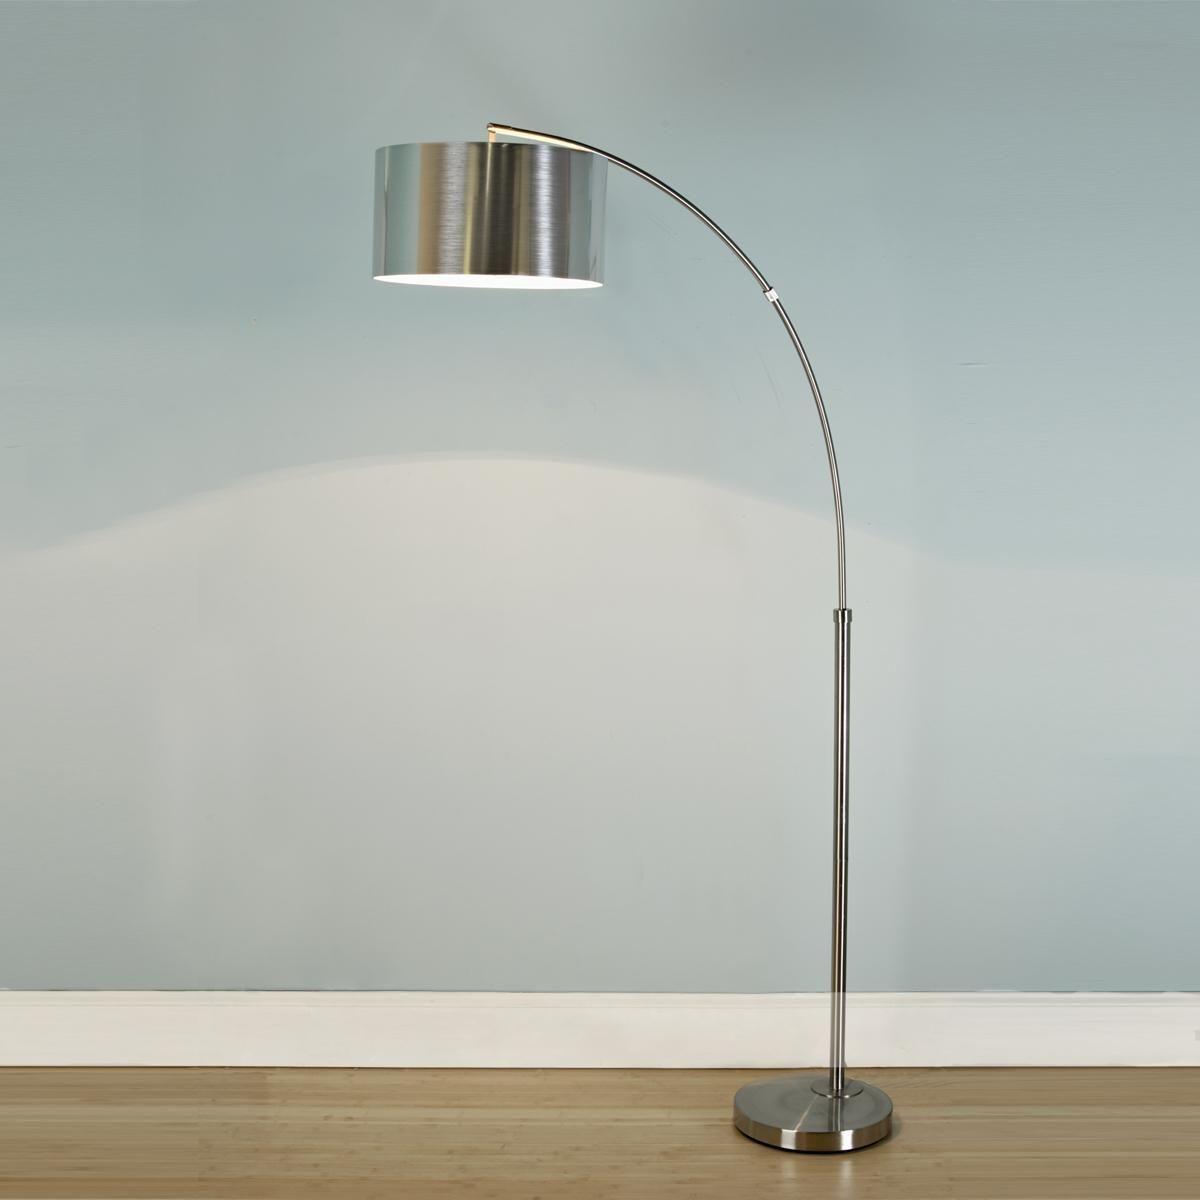 http://www.shadesoflight.com/nickel-arc-floor-lamp-with-silver-drum ...